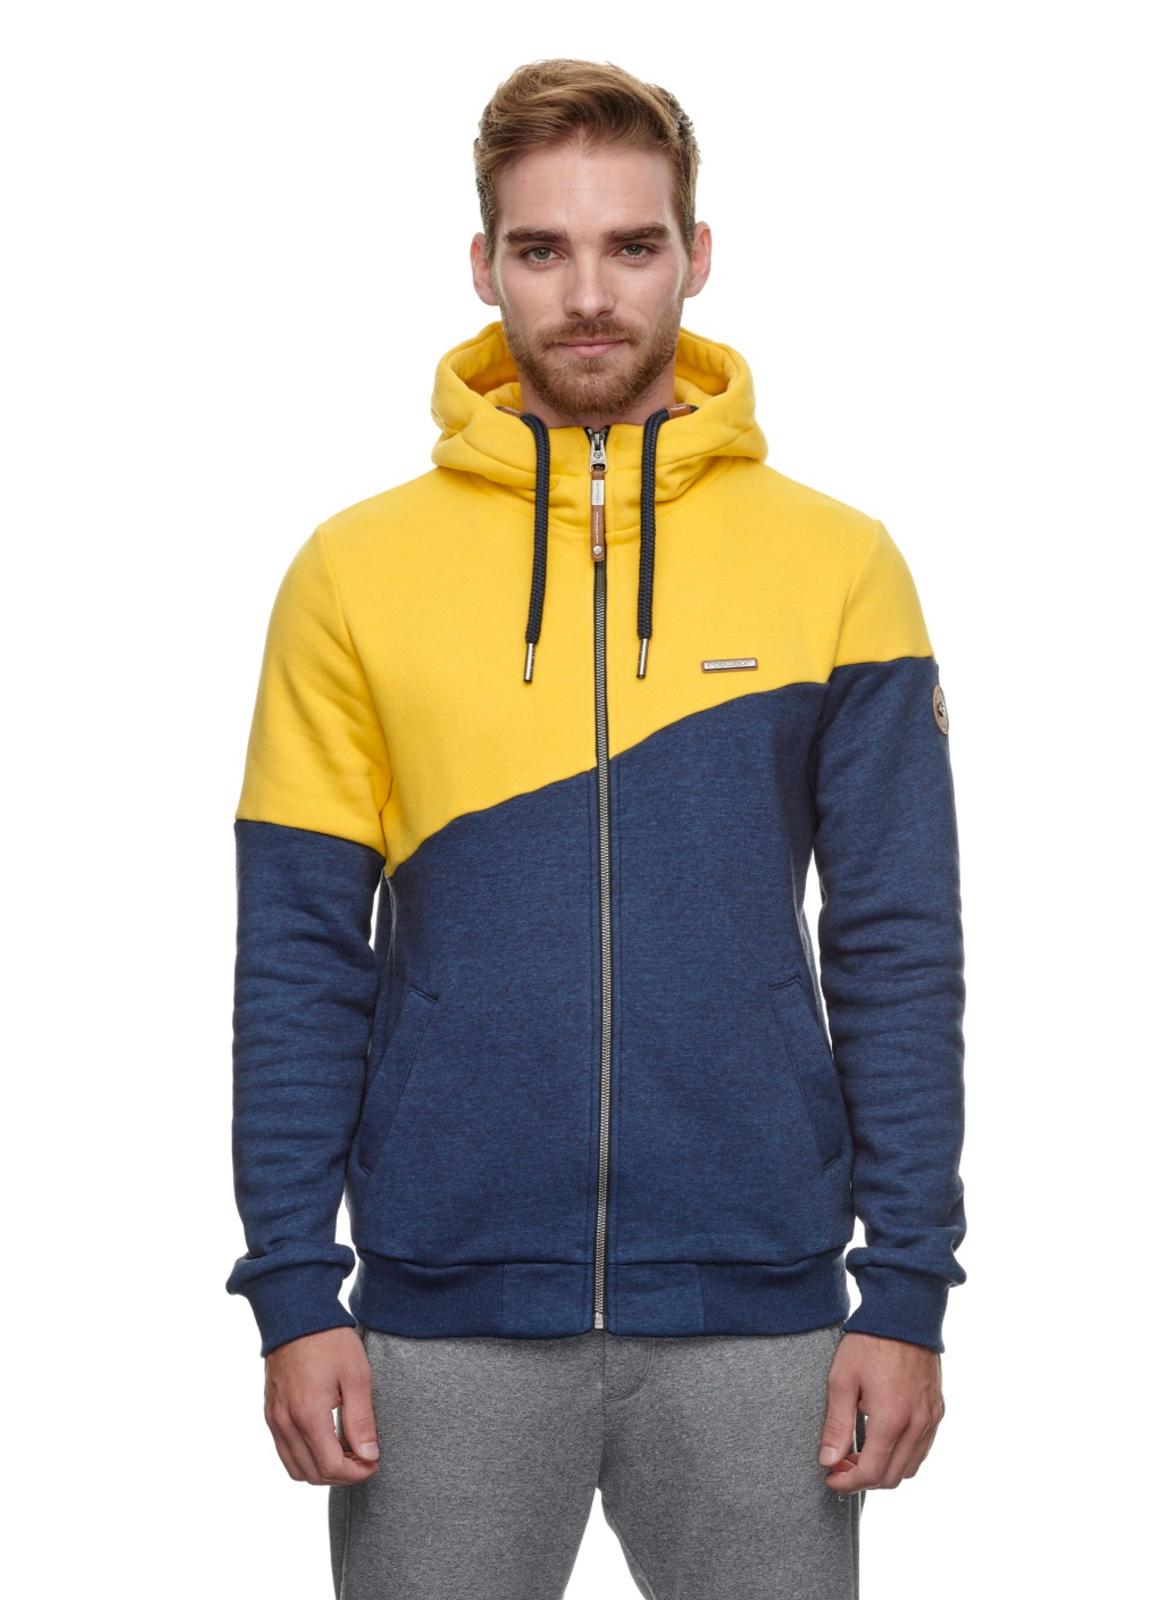 Ragwear Sweat Jacke Vegan gelb blau unifarben Wings Sweat 2112 30020 6028 yellow